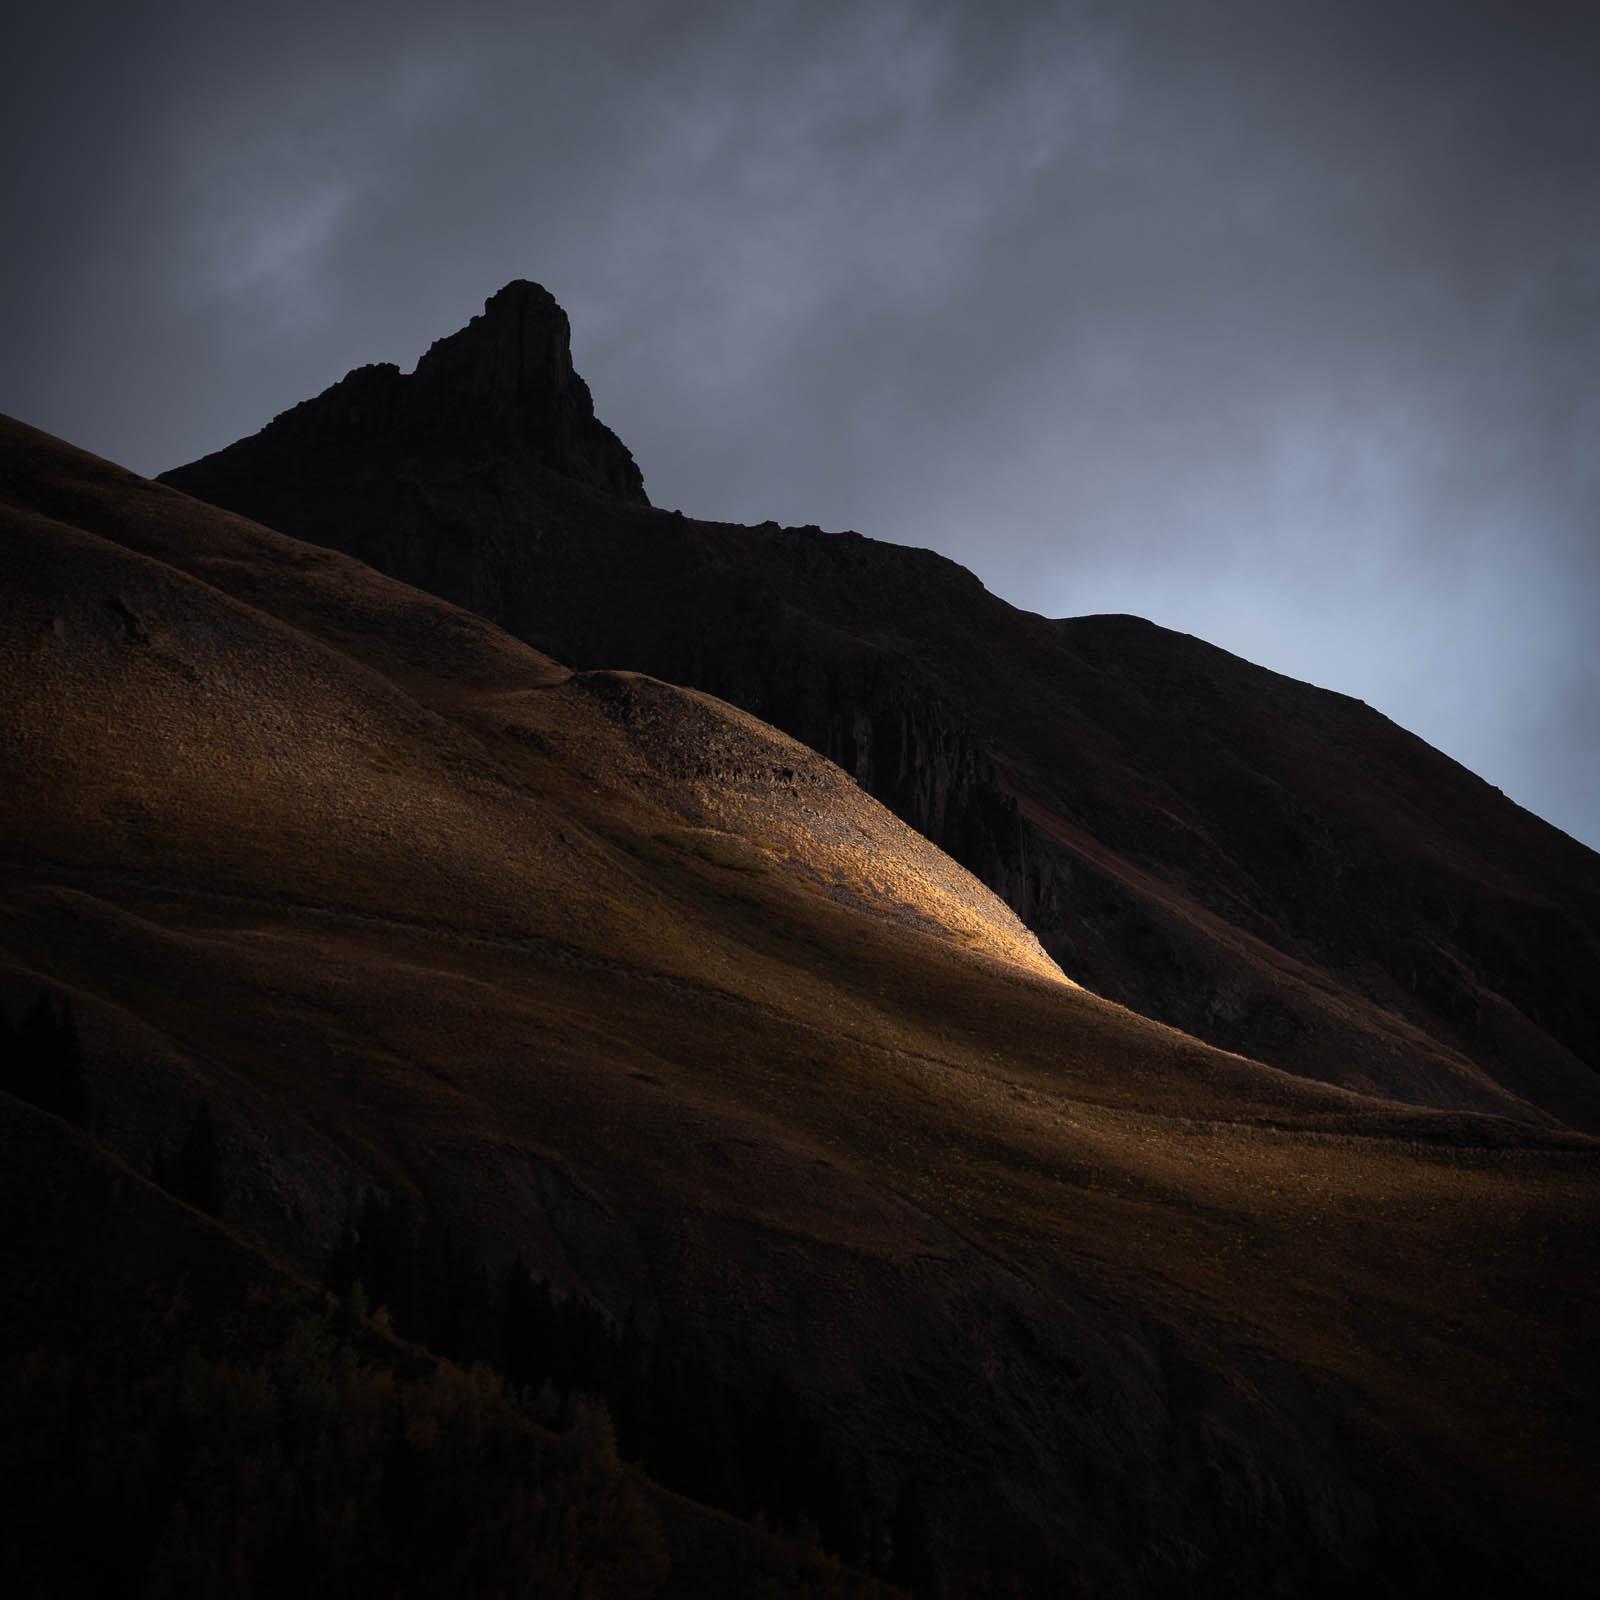 blue, colorado, fall, orange, rocky mountains, san juan mountains, square